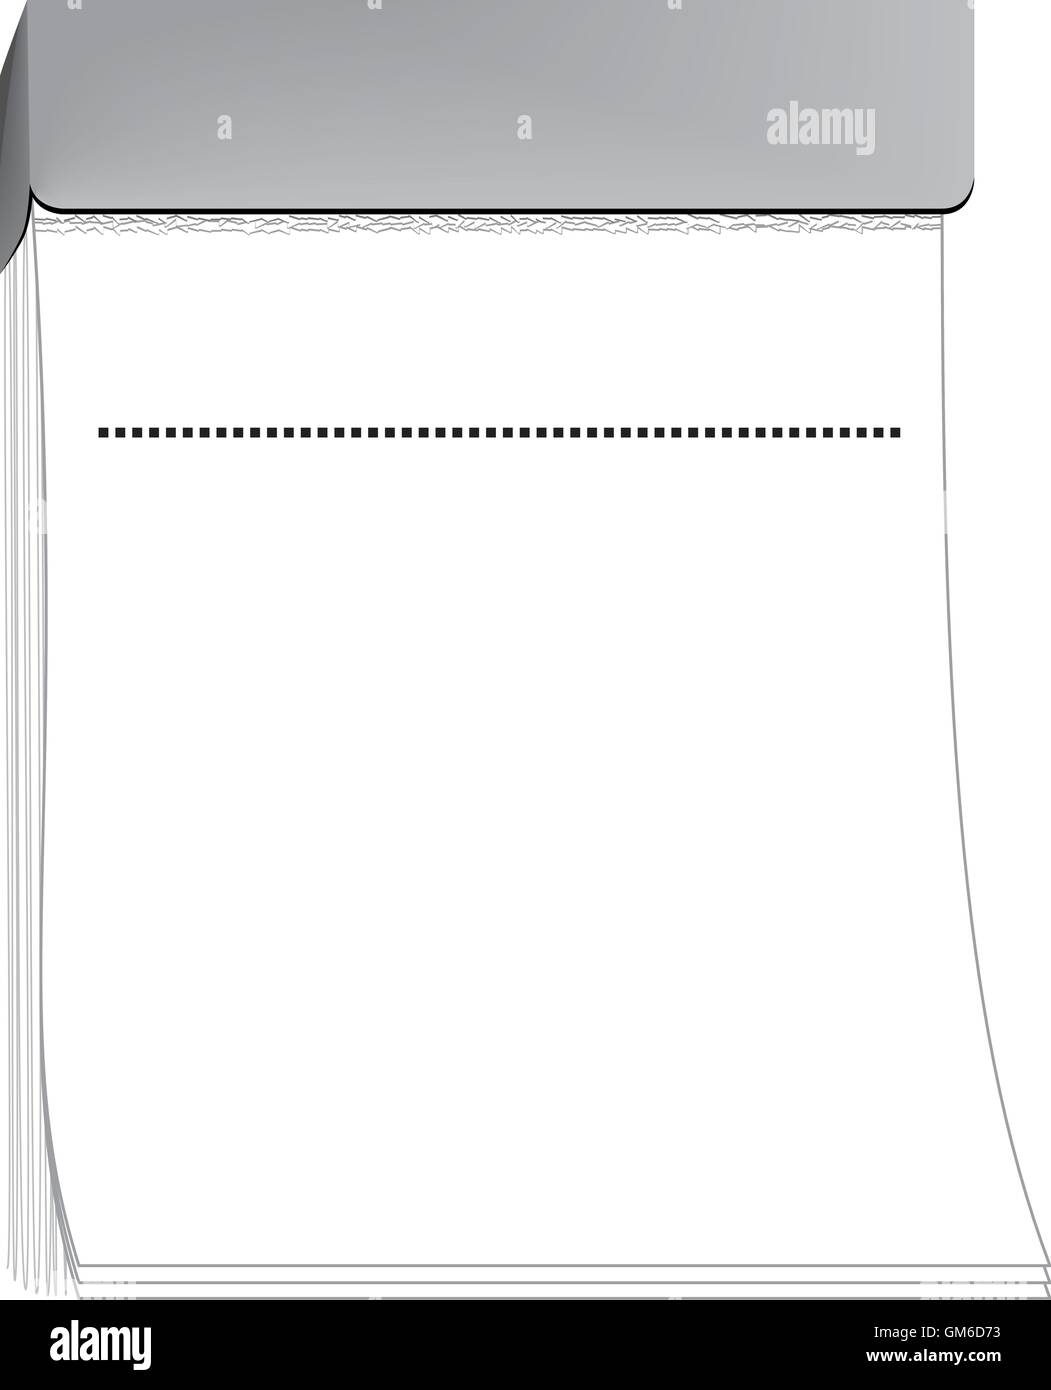 blank tear off calendar - Stock Image